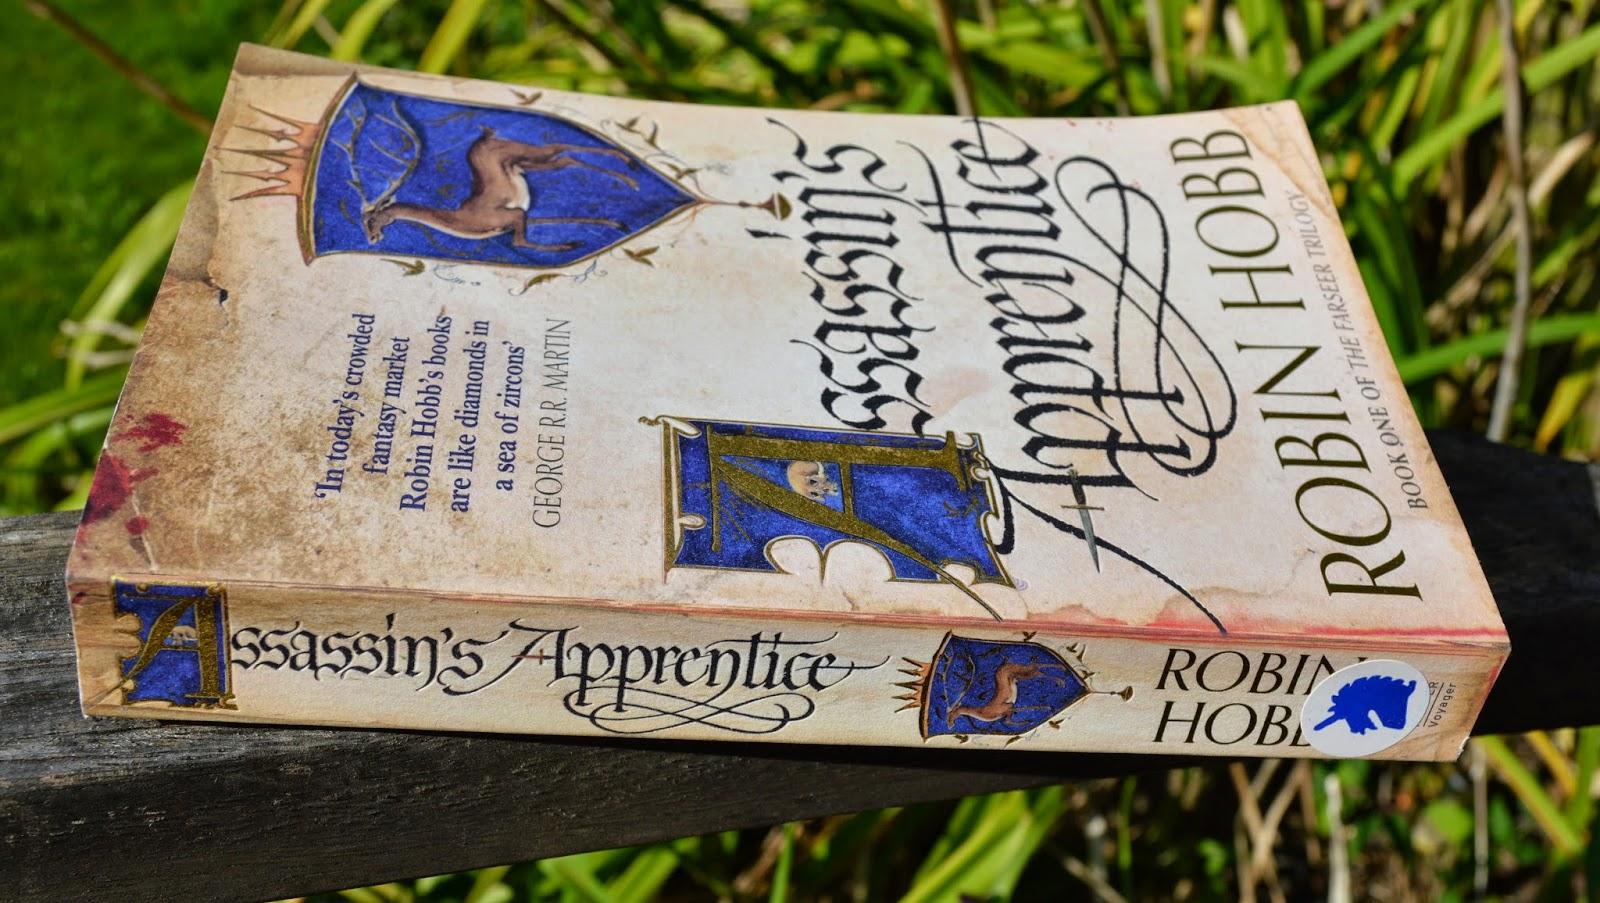 Assassin's Apprentice, Robin Hobb, George RR Martin, fantasy, series, Fitz, review, book